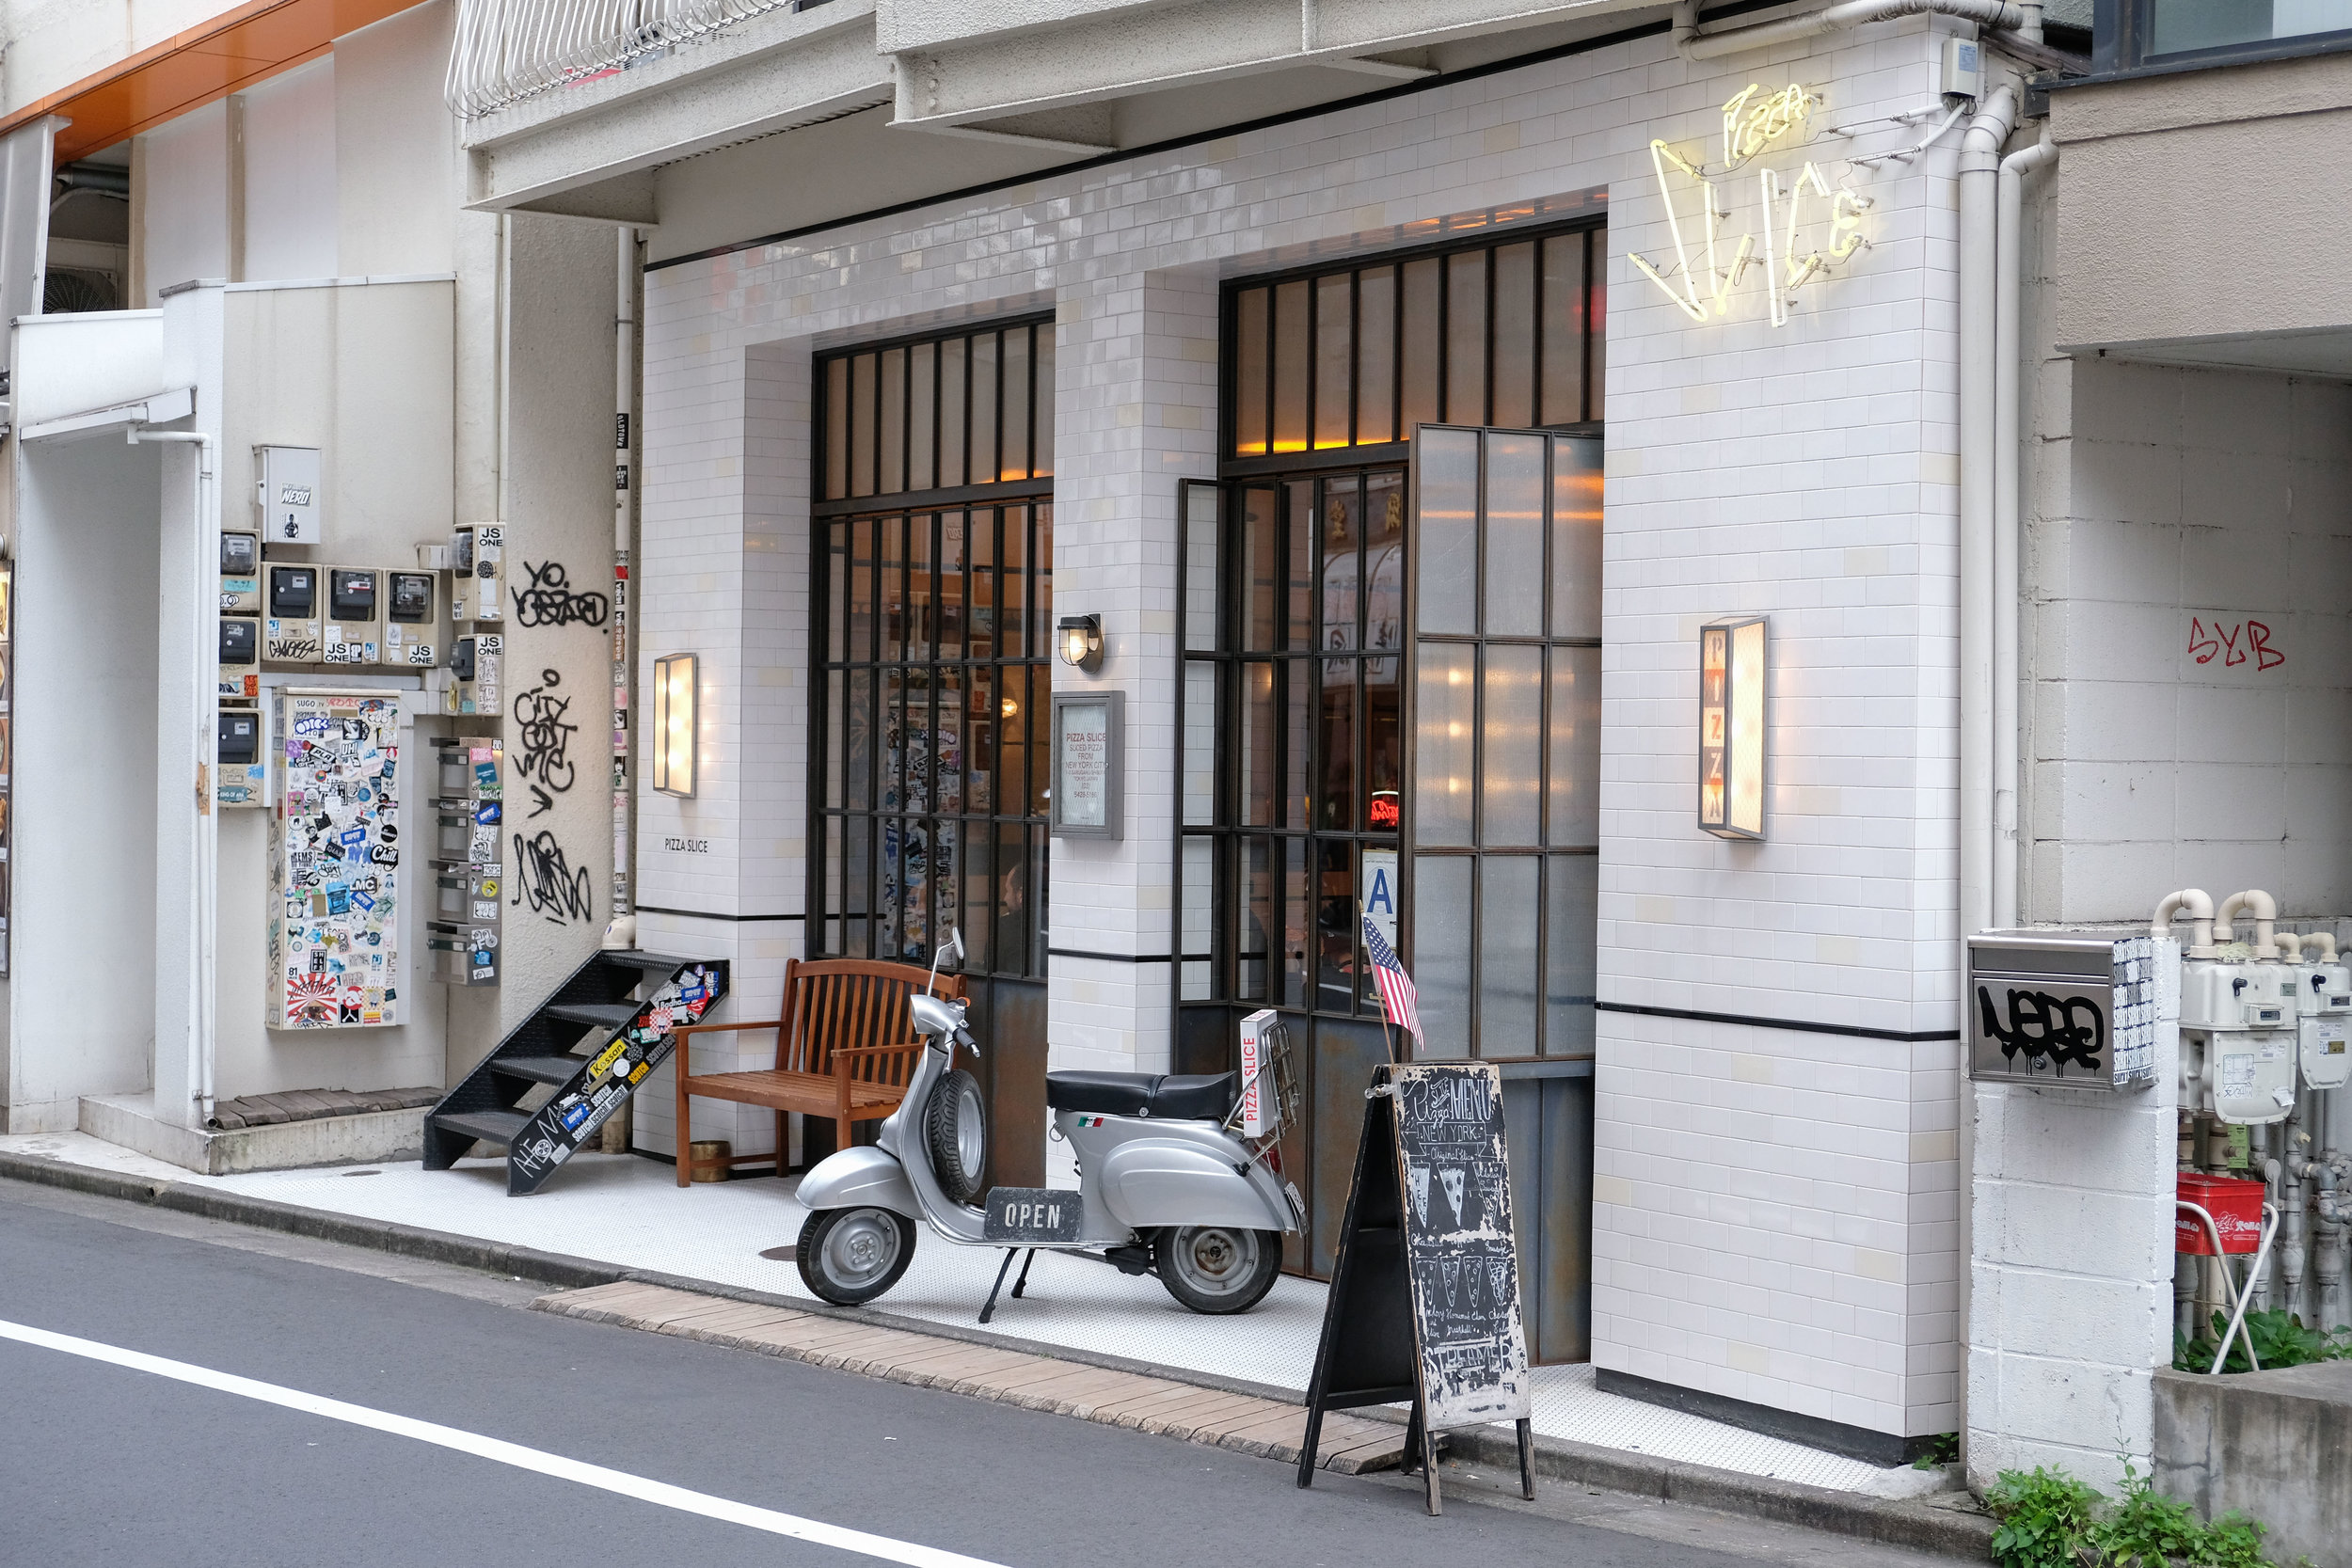 Tokyo Neighborhood Guide: Daikanyama - November 6th, 2017